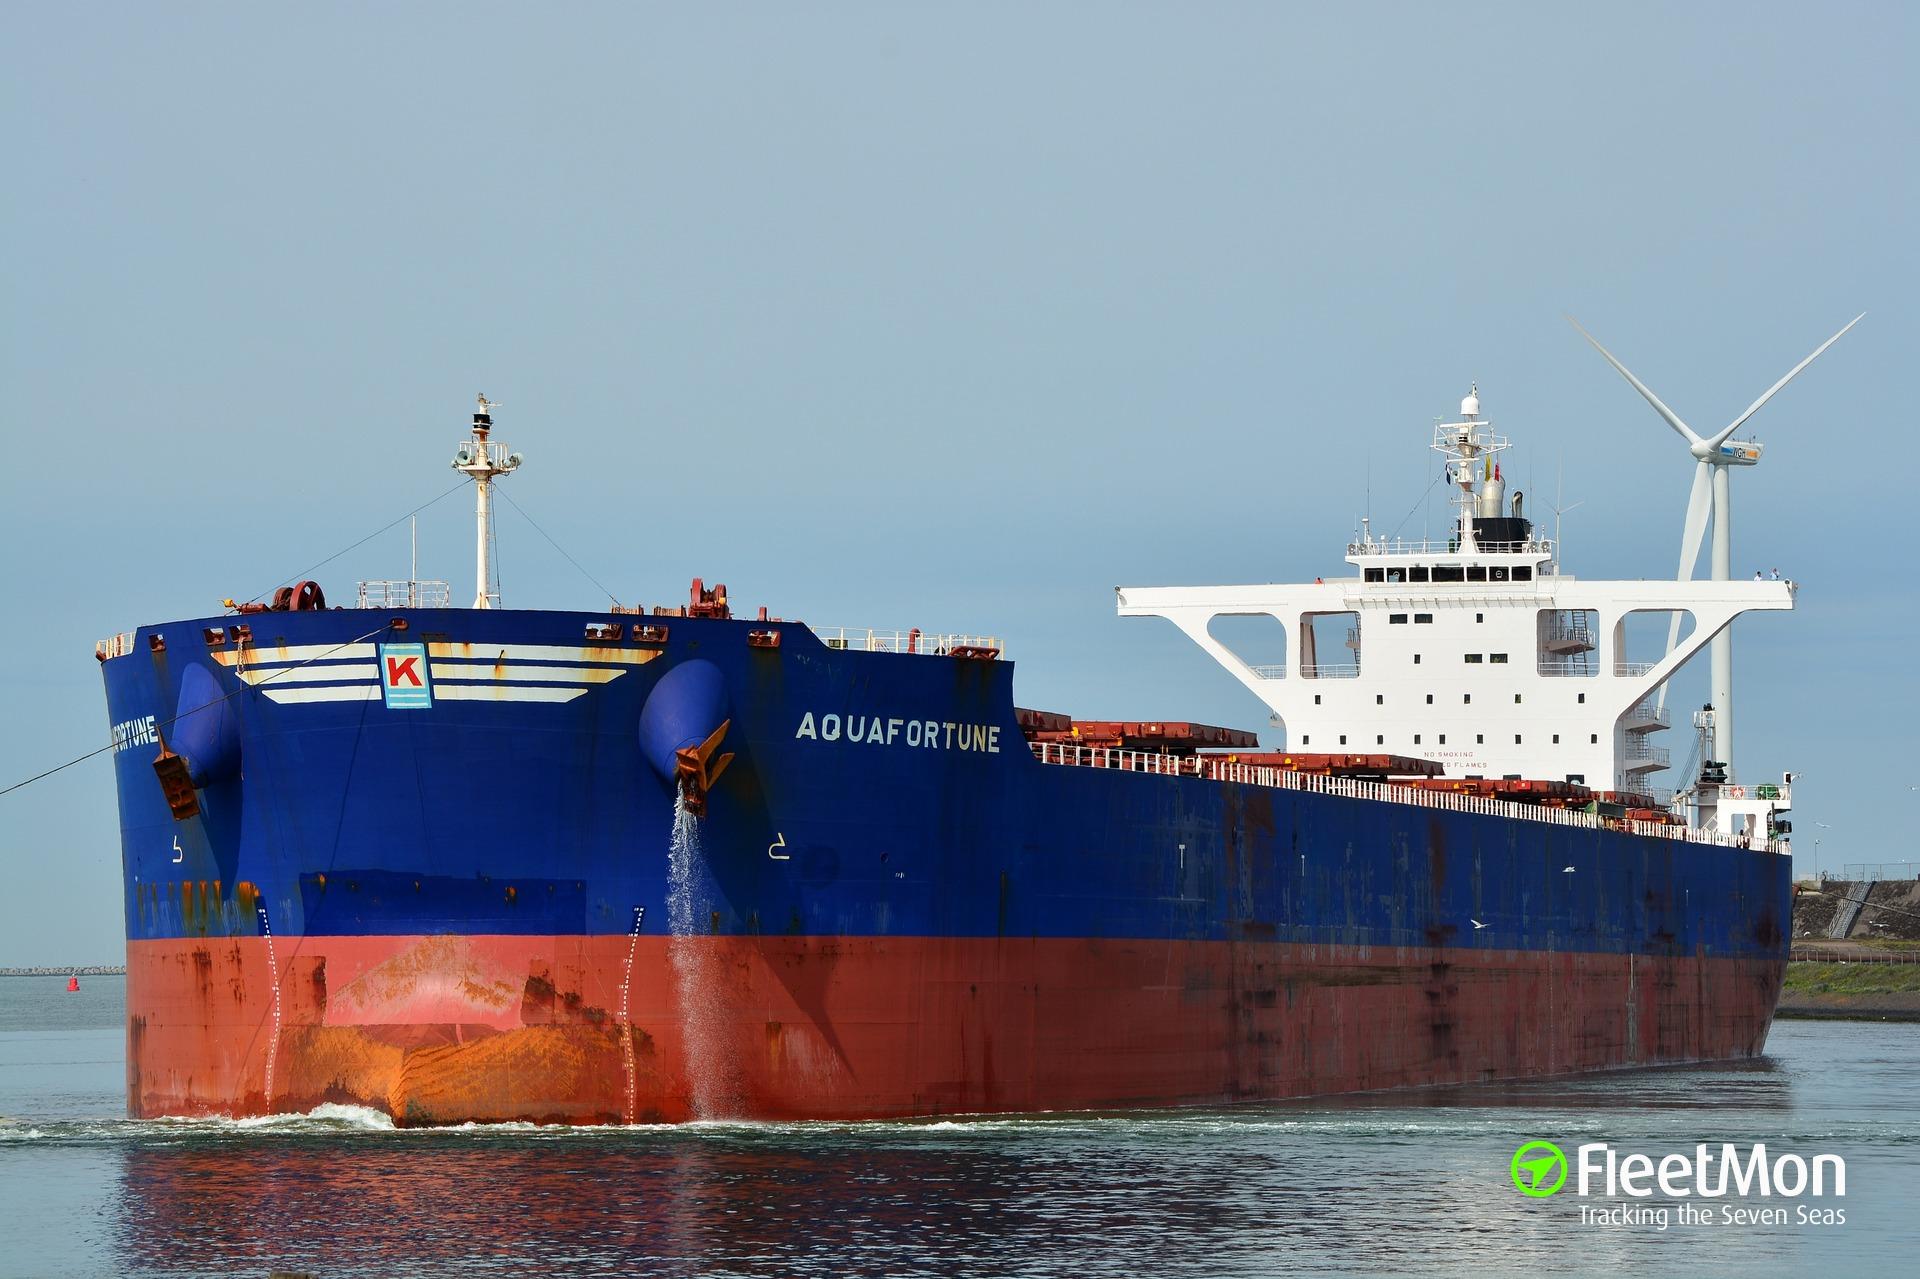 Capesize bulk carrier Aquafortune aground in Black sea